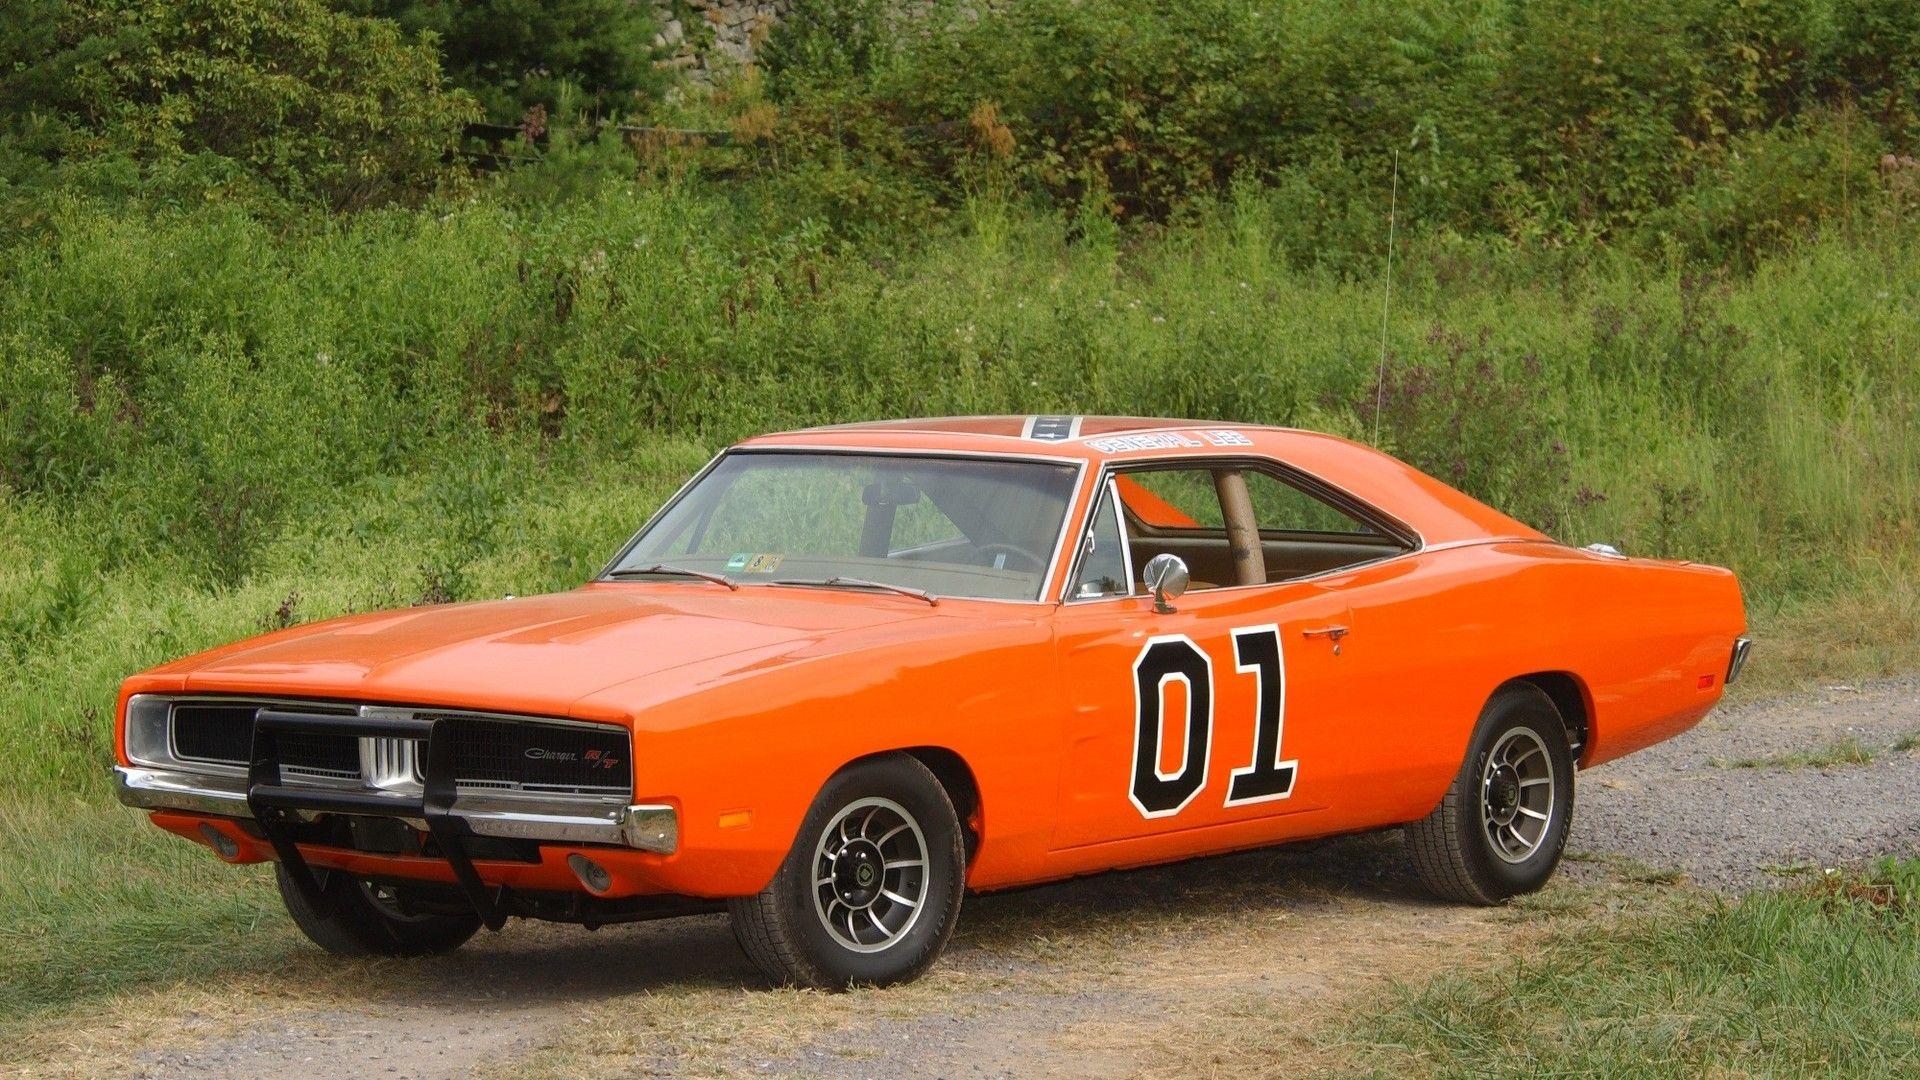 Dukes Of Hazard Car Yea Baby 60s Muscle Cars